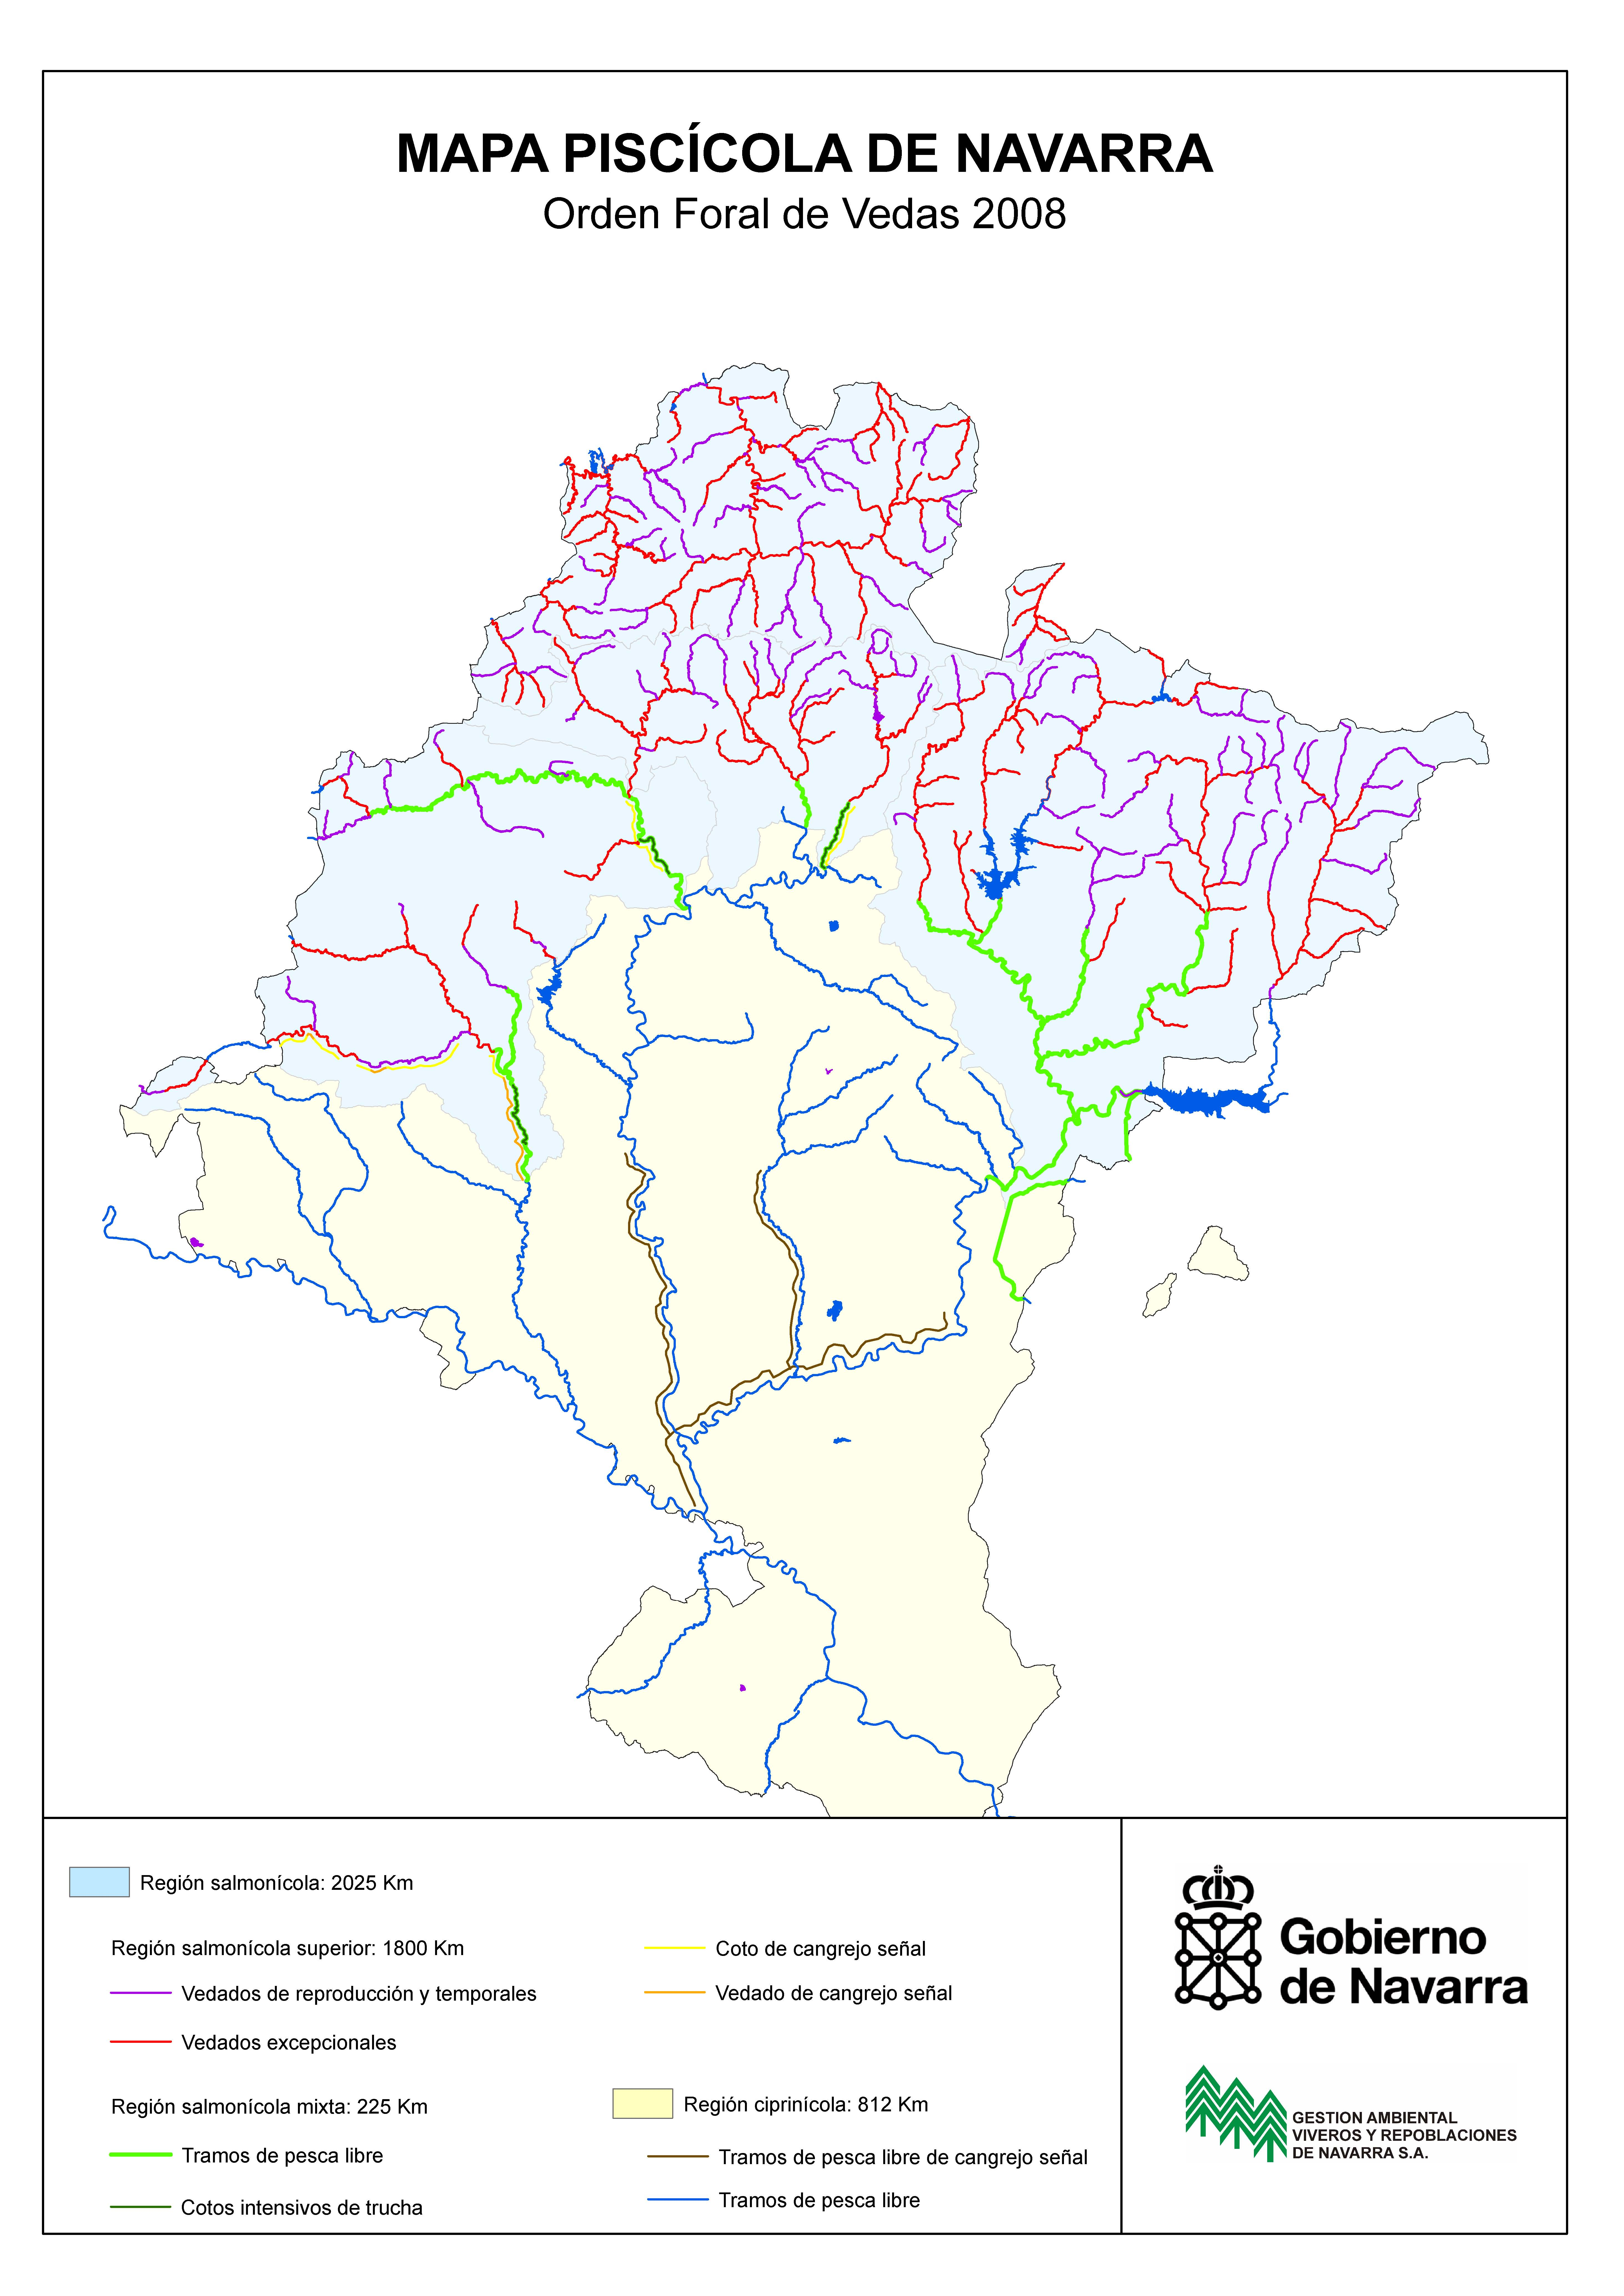 Mapa piscícola de Navarra 2008